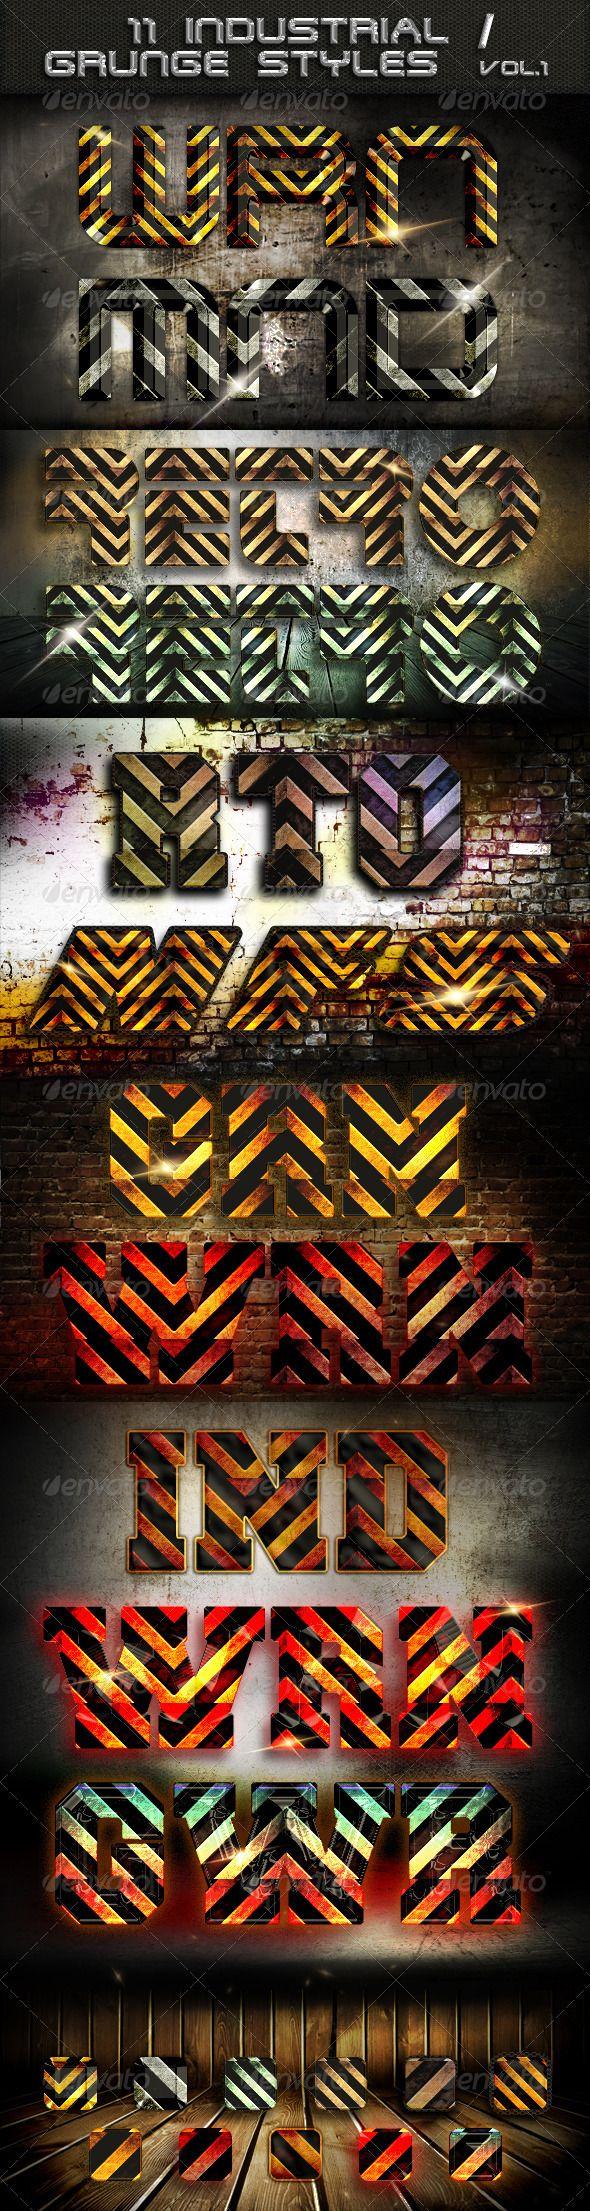 11 Industrial / Grunge  Styles